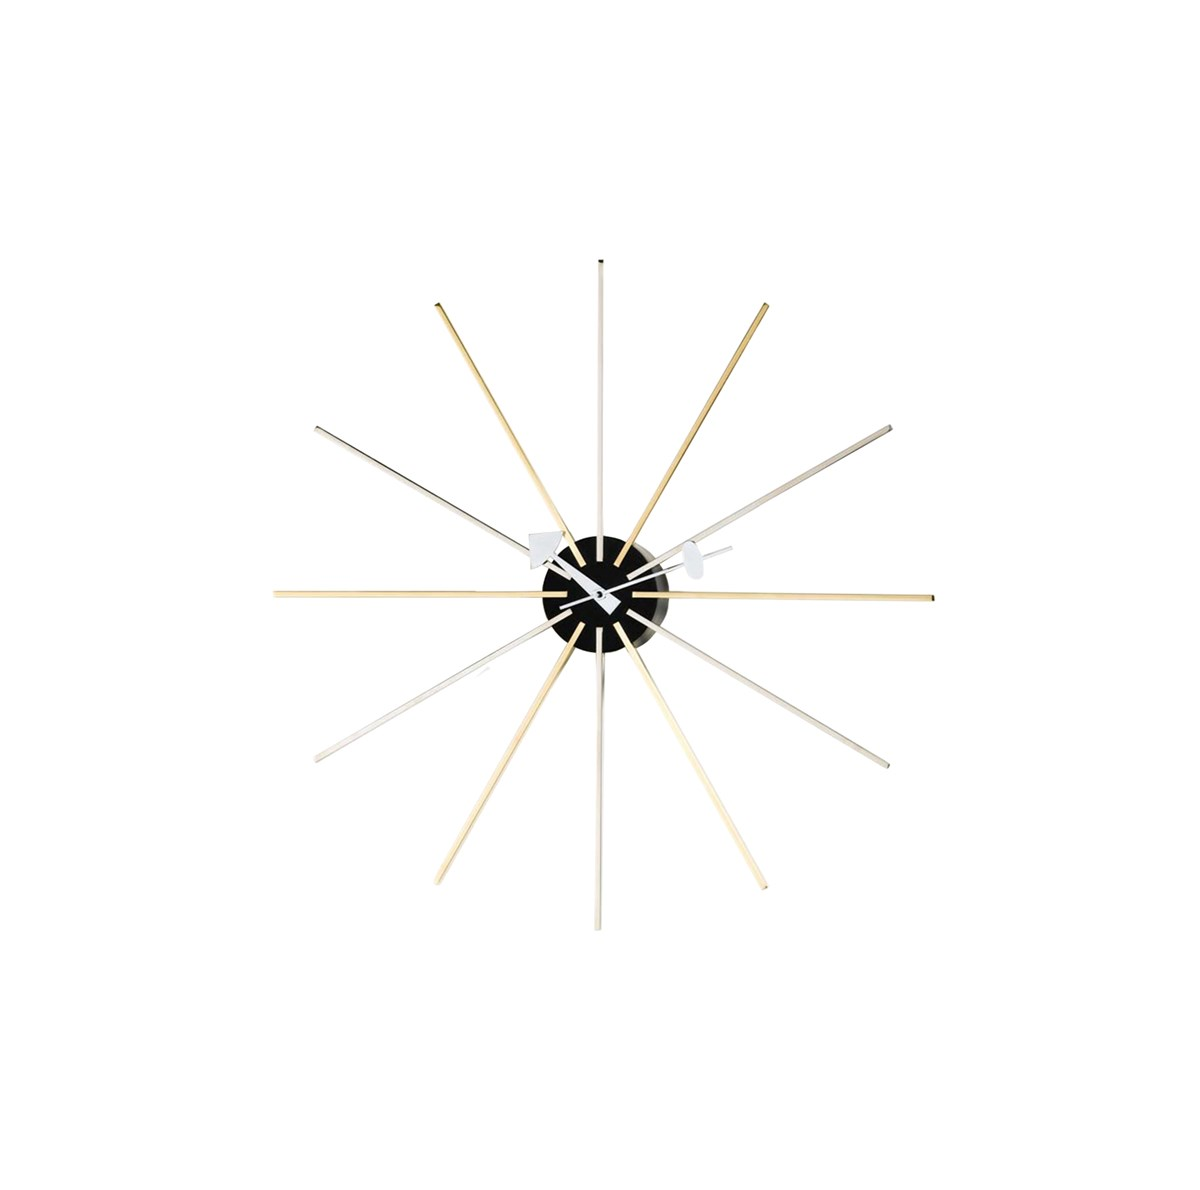 Vitra-George-Nelson-Star-Wall-Clock-Matisse-1 (1)